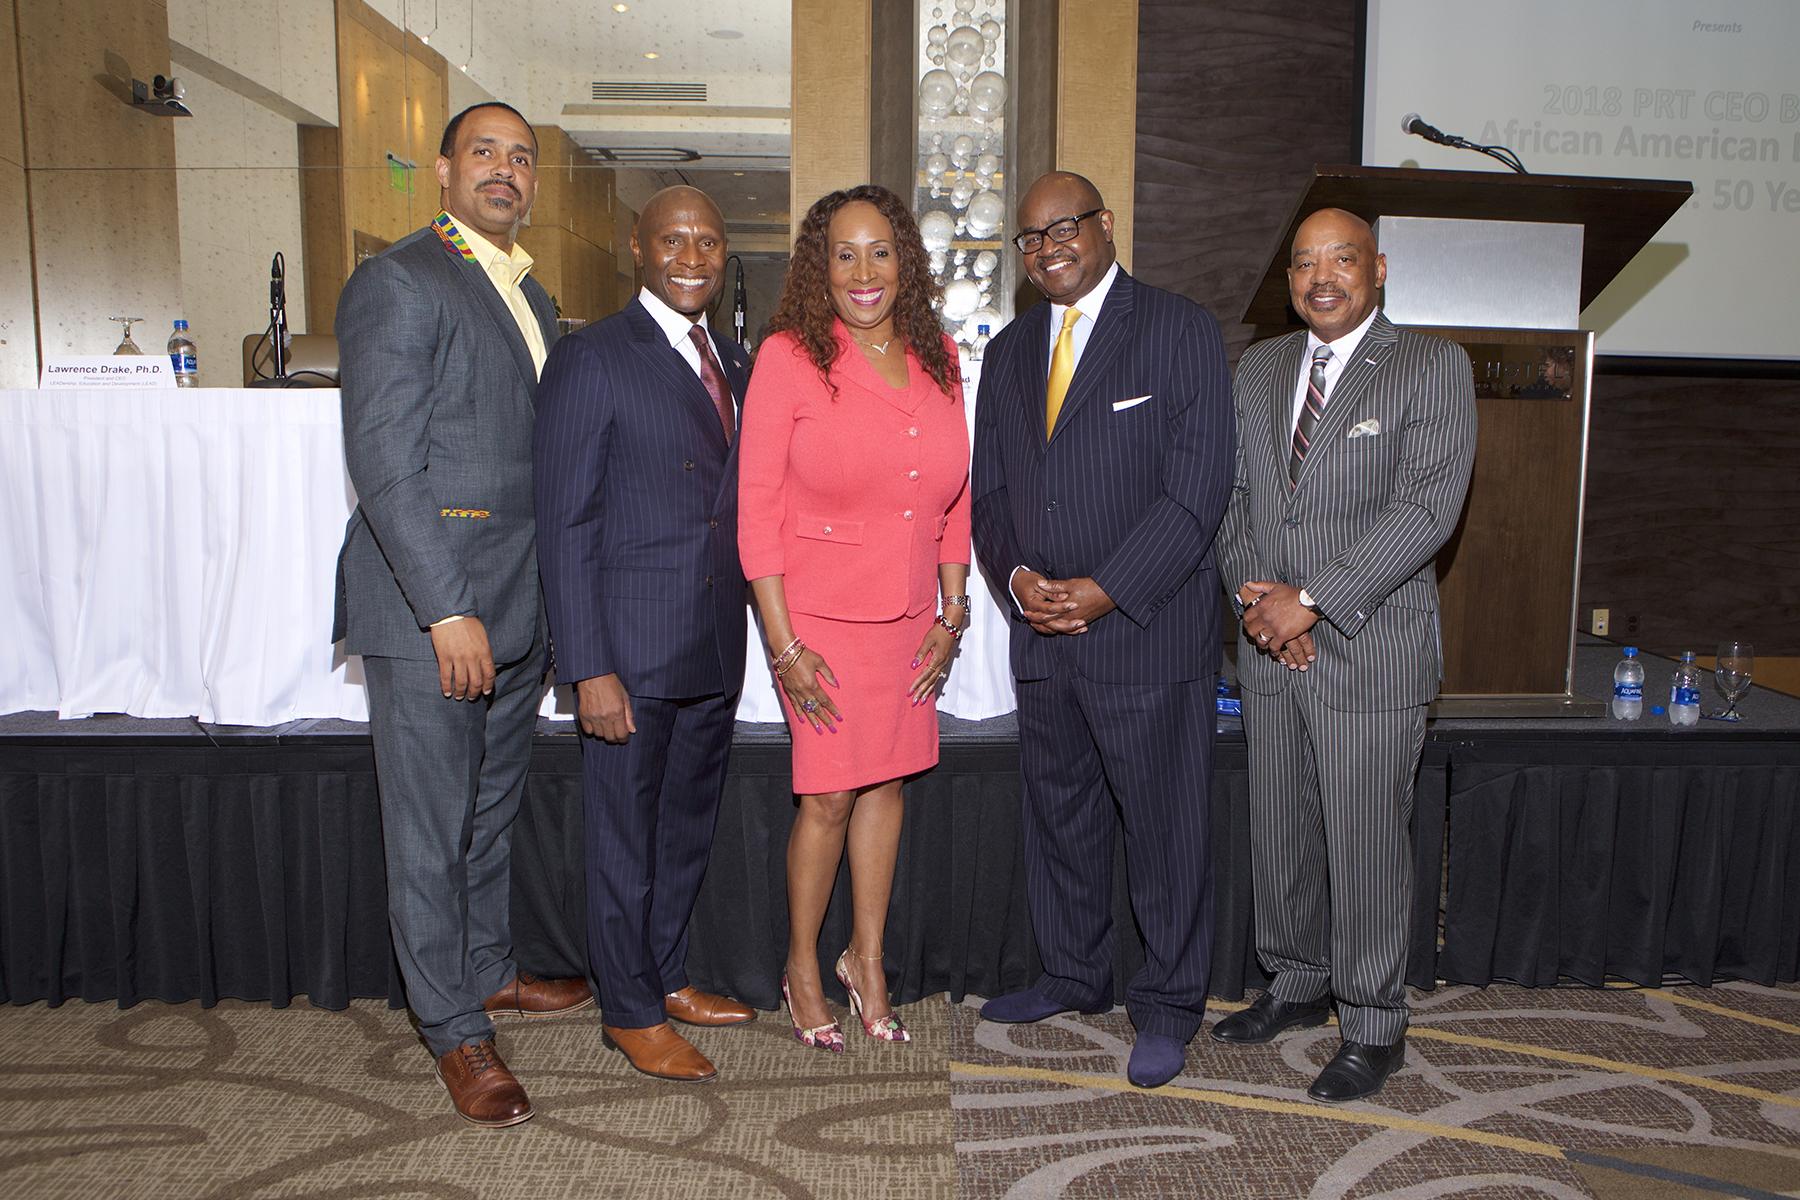 Dedrick Asante-Muhammad, Robert L. Wallace, Dr. Sheila Brooks, Dr. Lawrence Drake, Jeffrey Hargrave